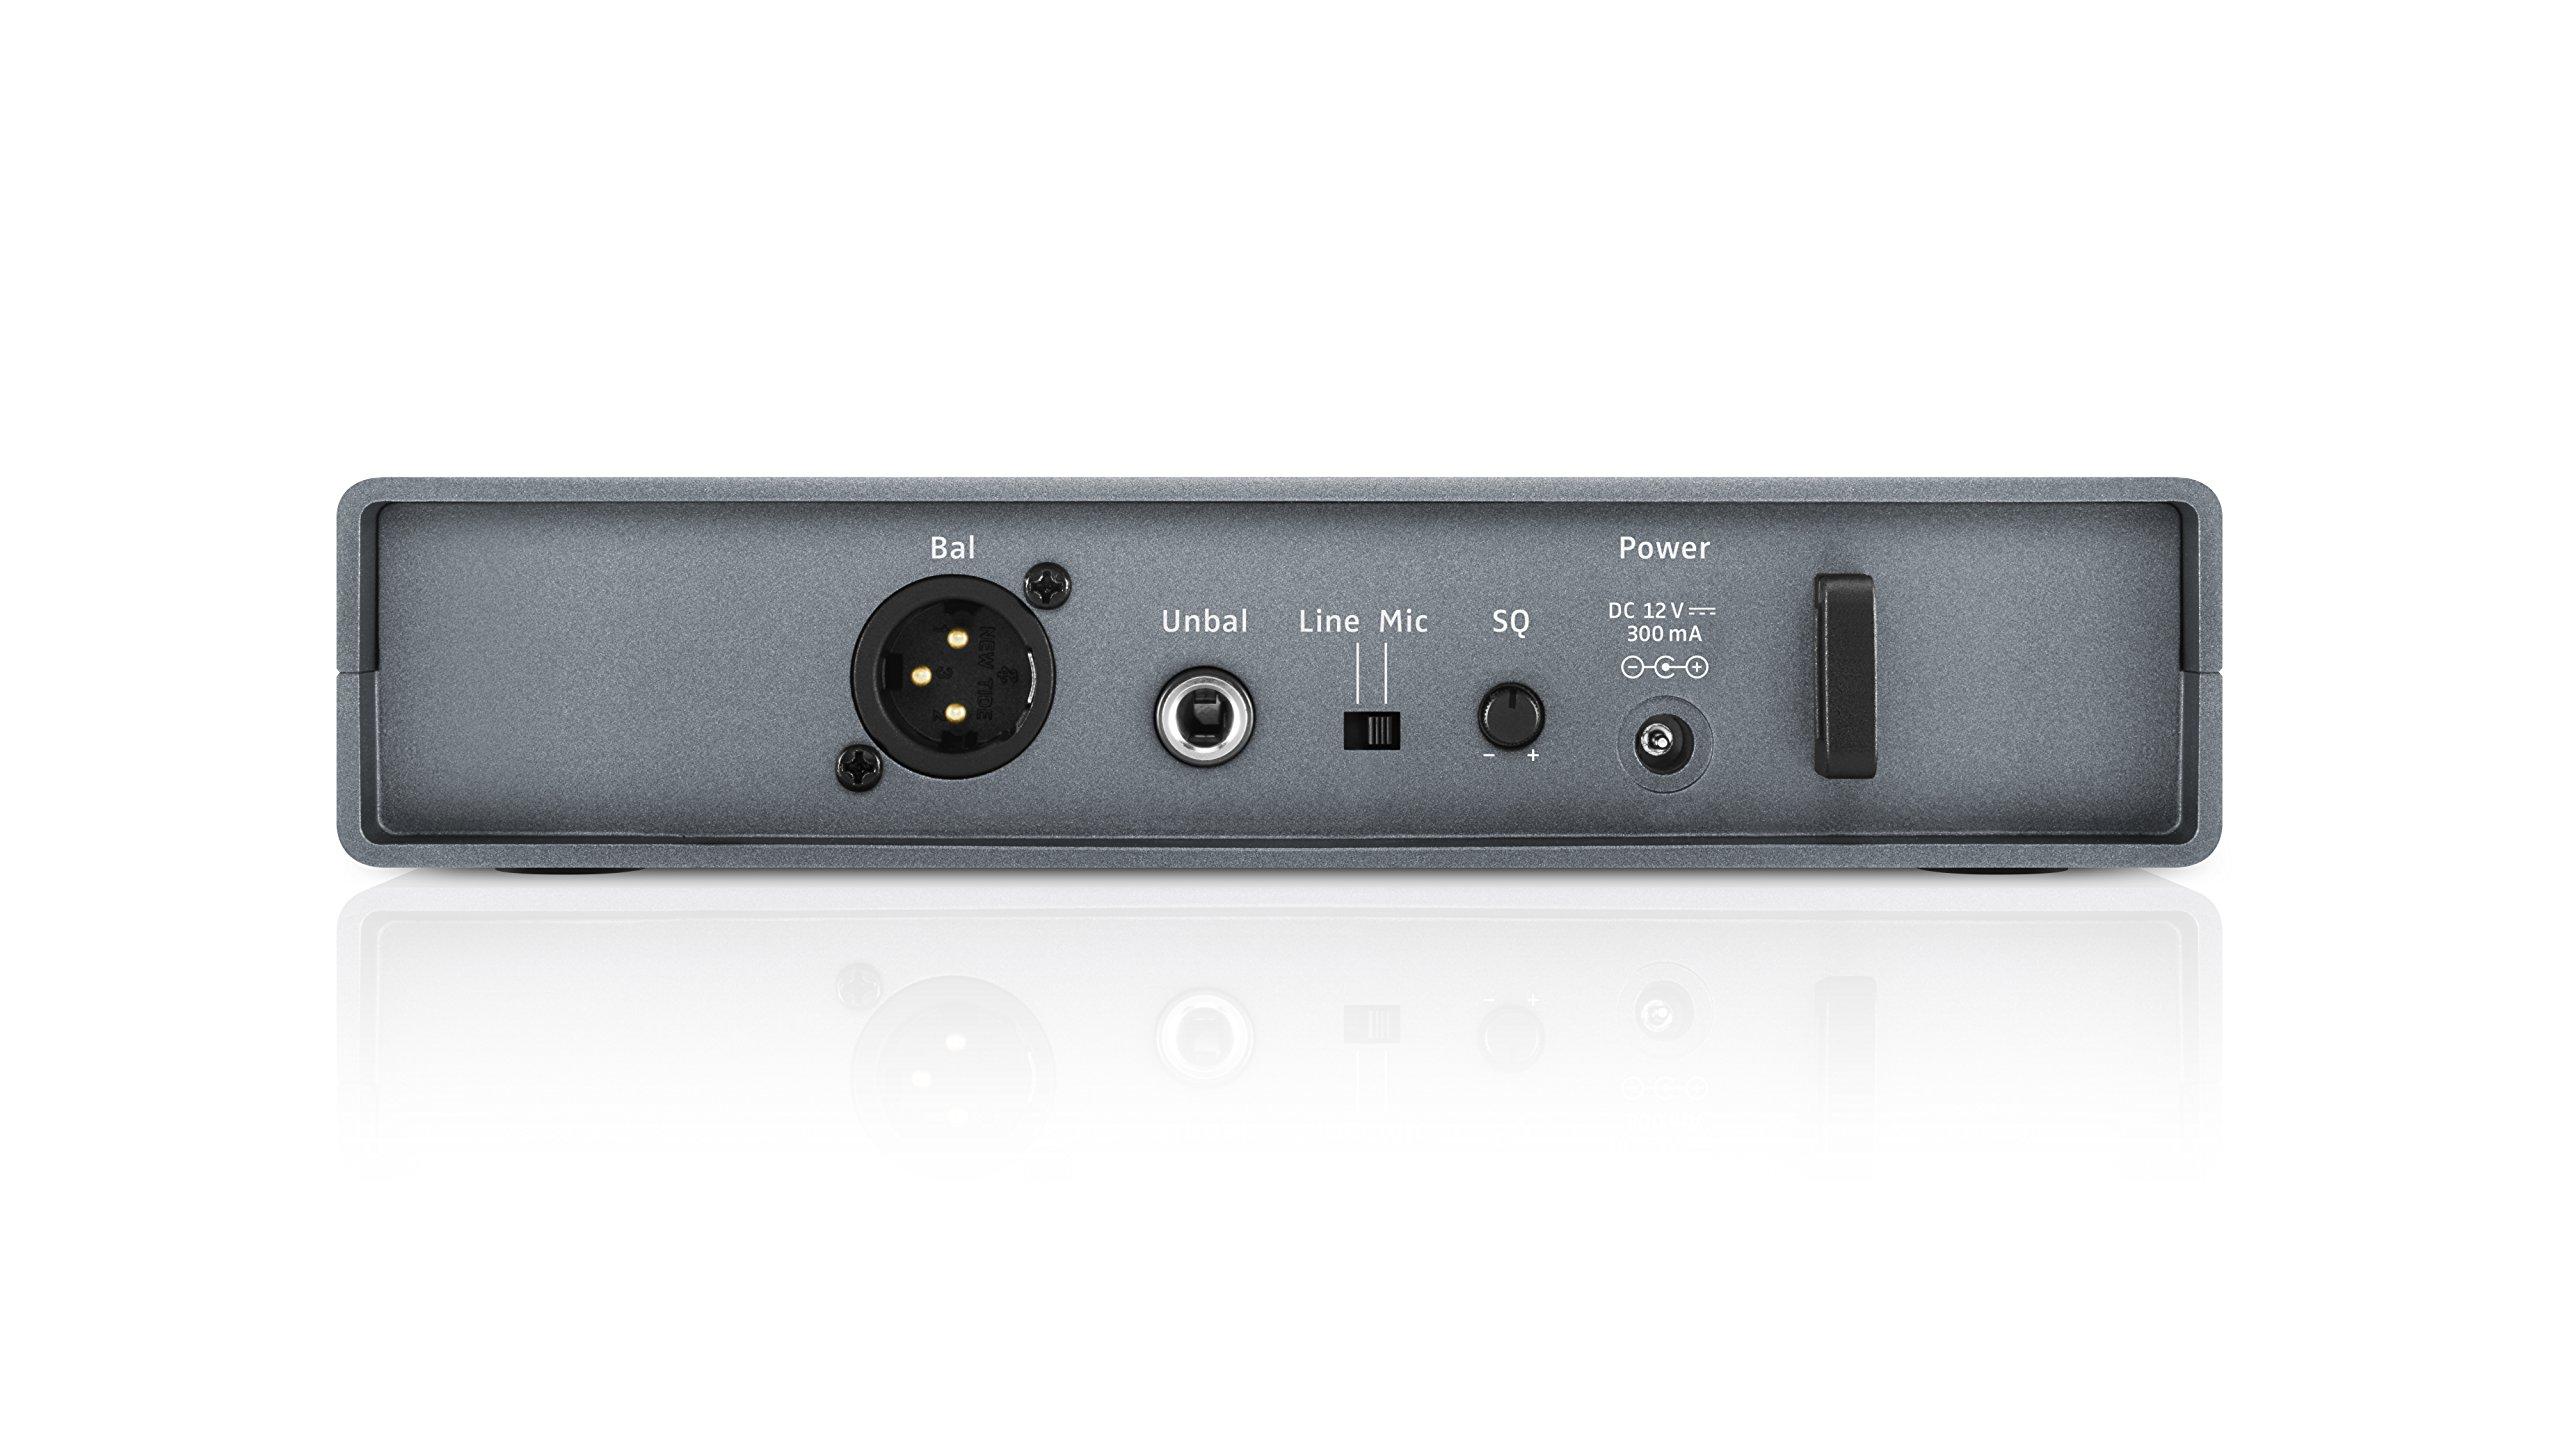 Sennheiser XSW 1-ME2-A Wireless Presentation Microphone, A Range 548-572 MHz